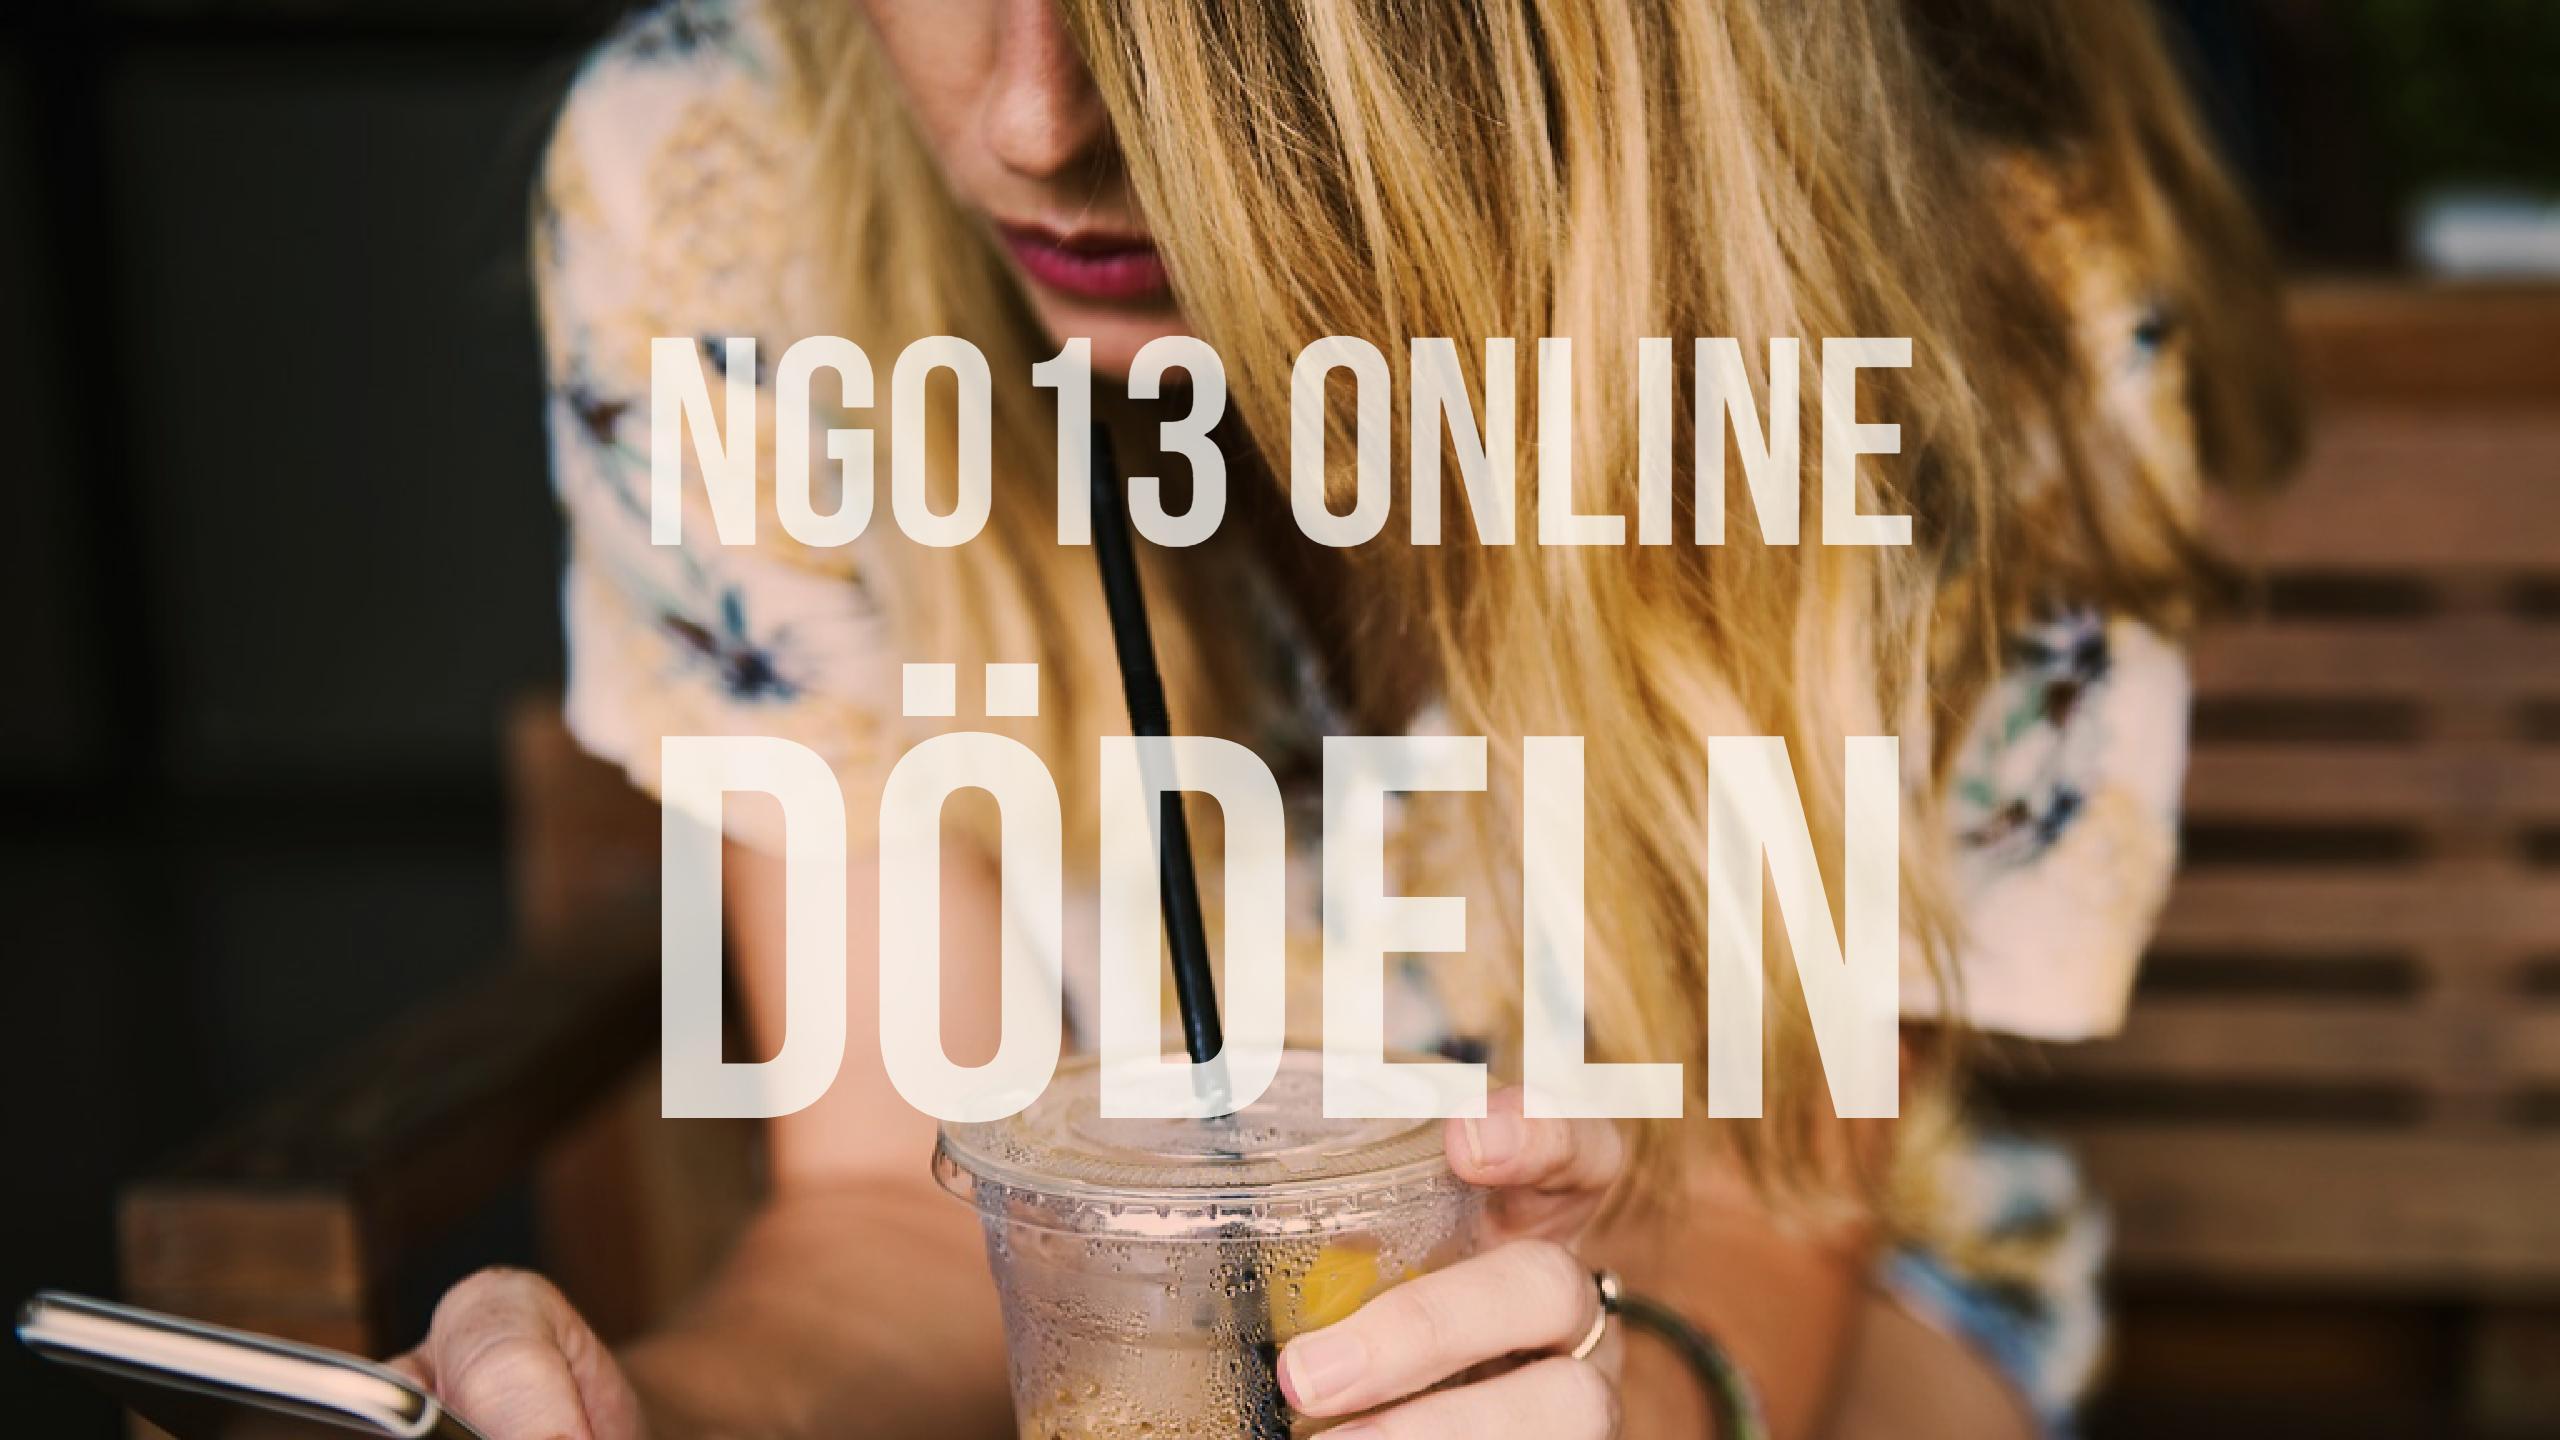 NG013 Online dödeln